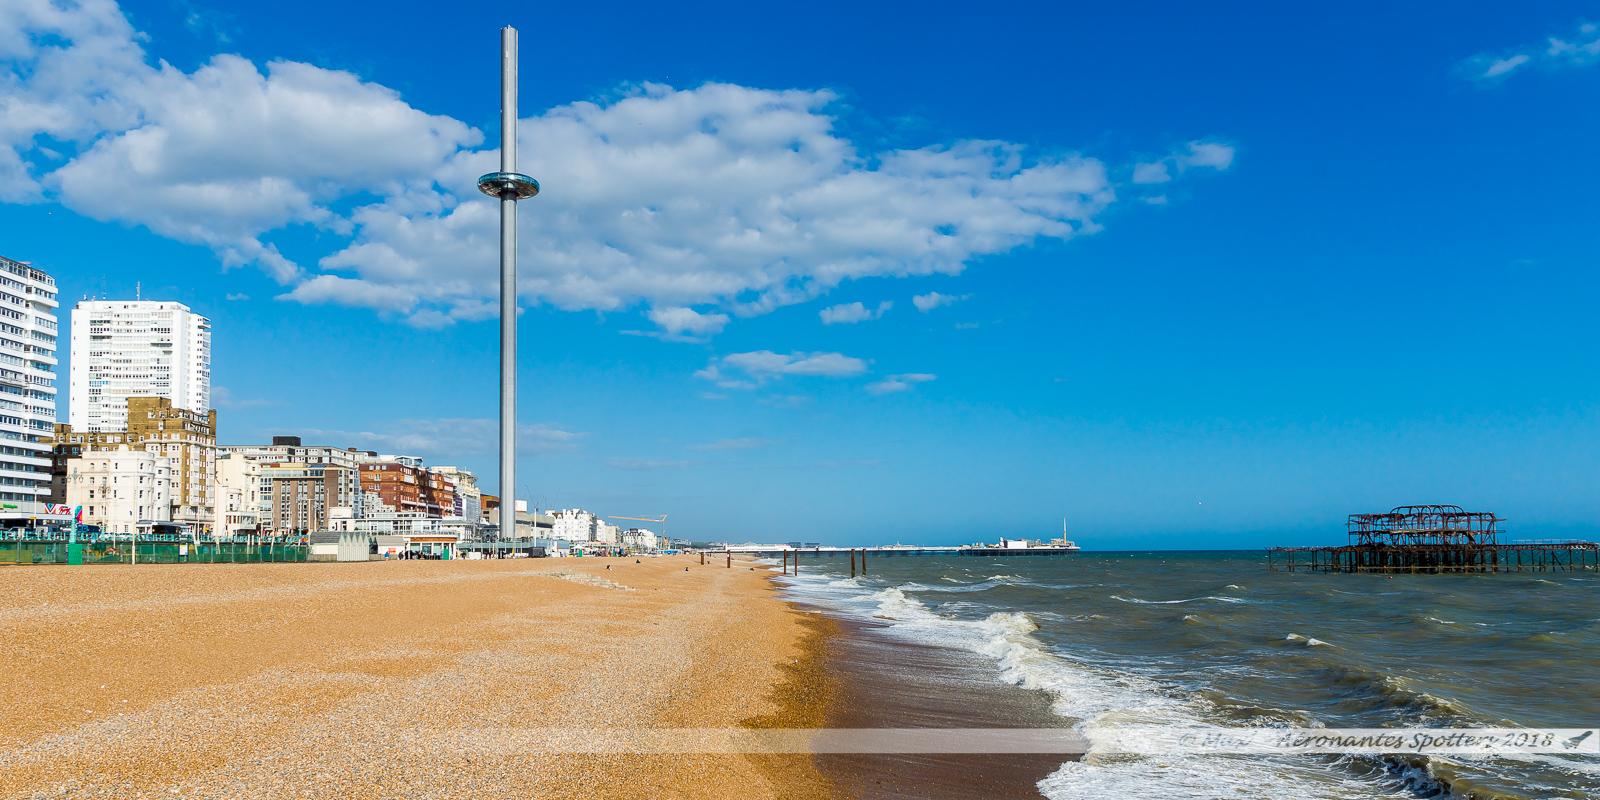 La baie de Brighton, sa tour British Airways I360, et son Pier